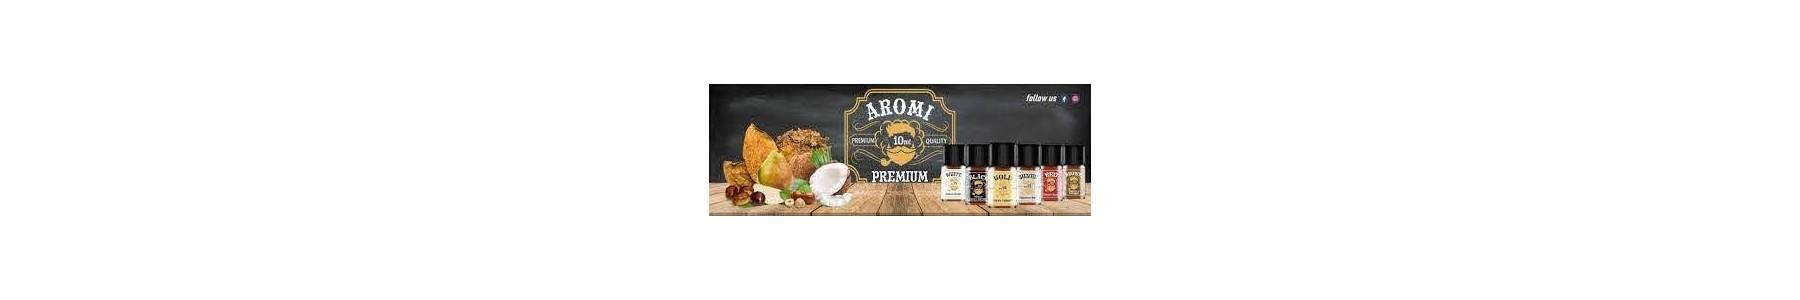 Tabaccosi Premium